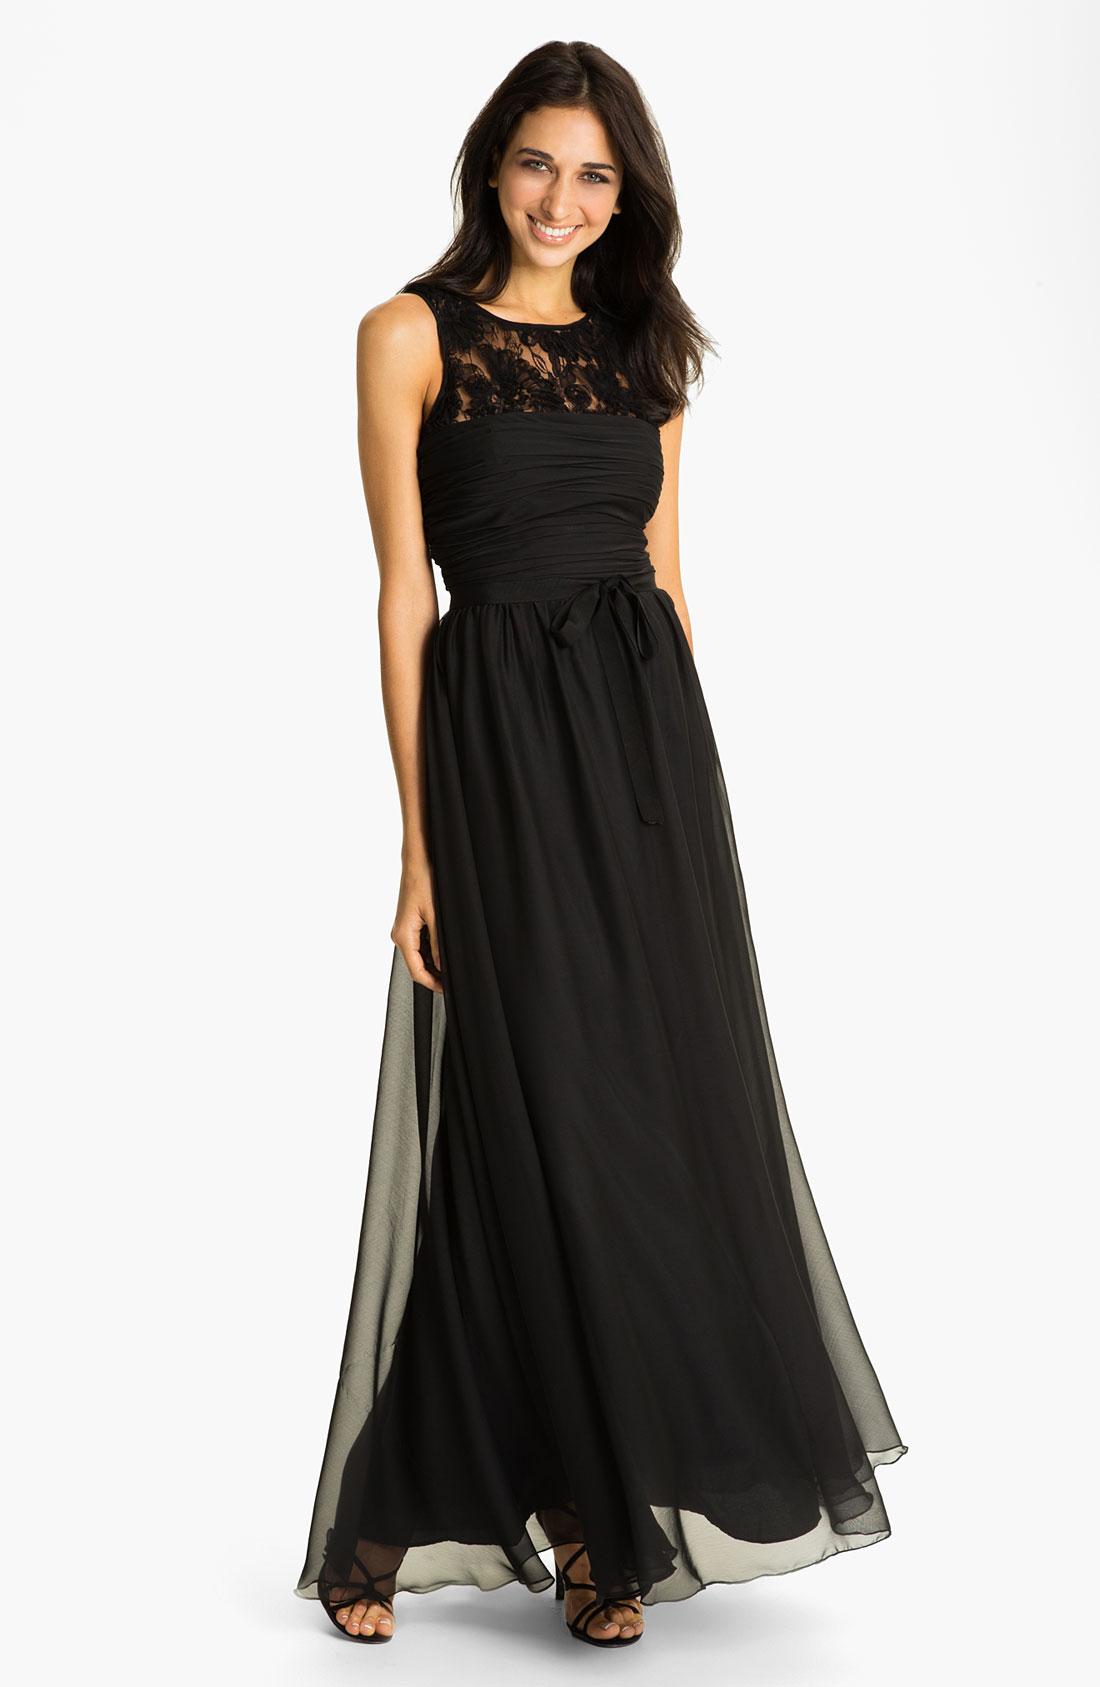 Ml Monique Lhuillier Bridesmaids Chiffon Gown In Black Lyst